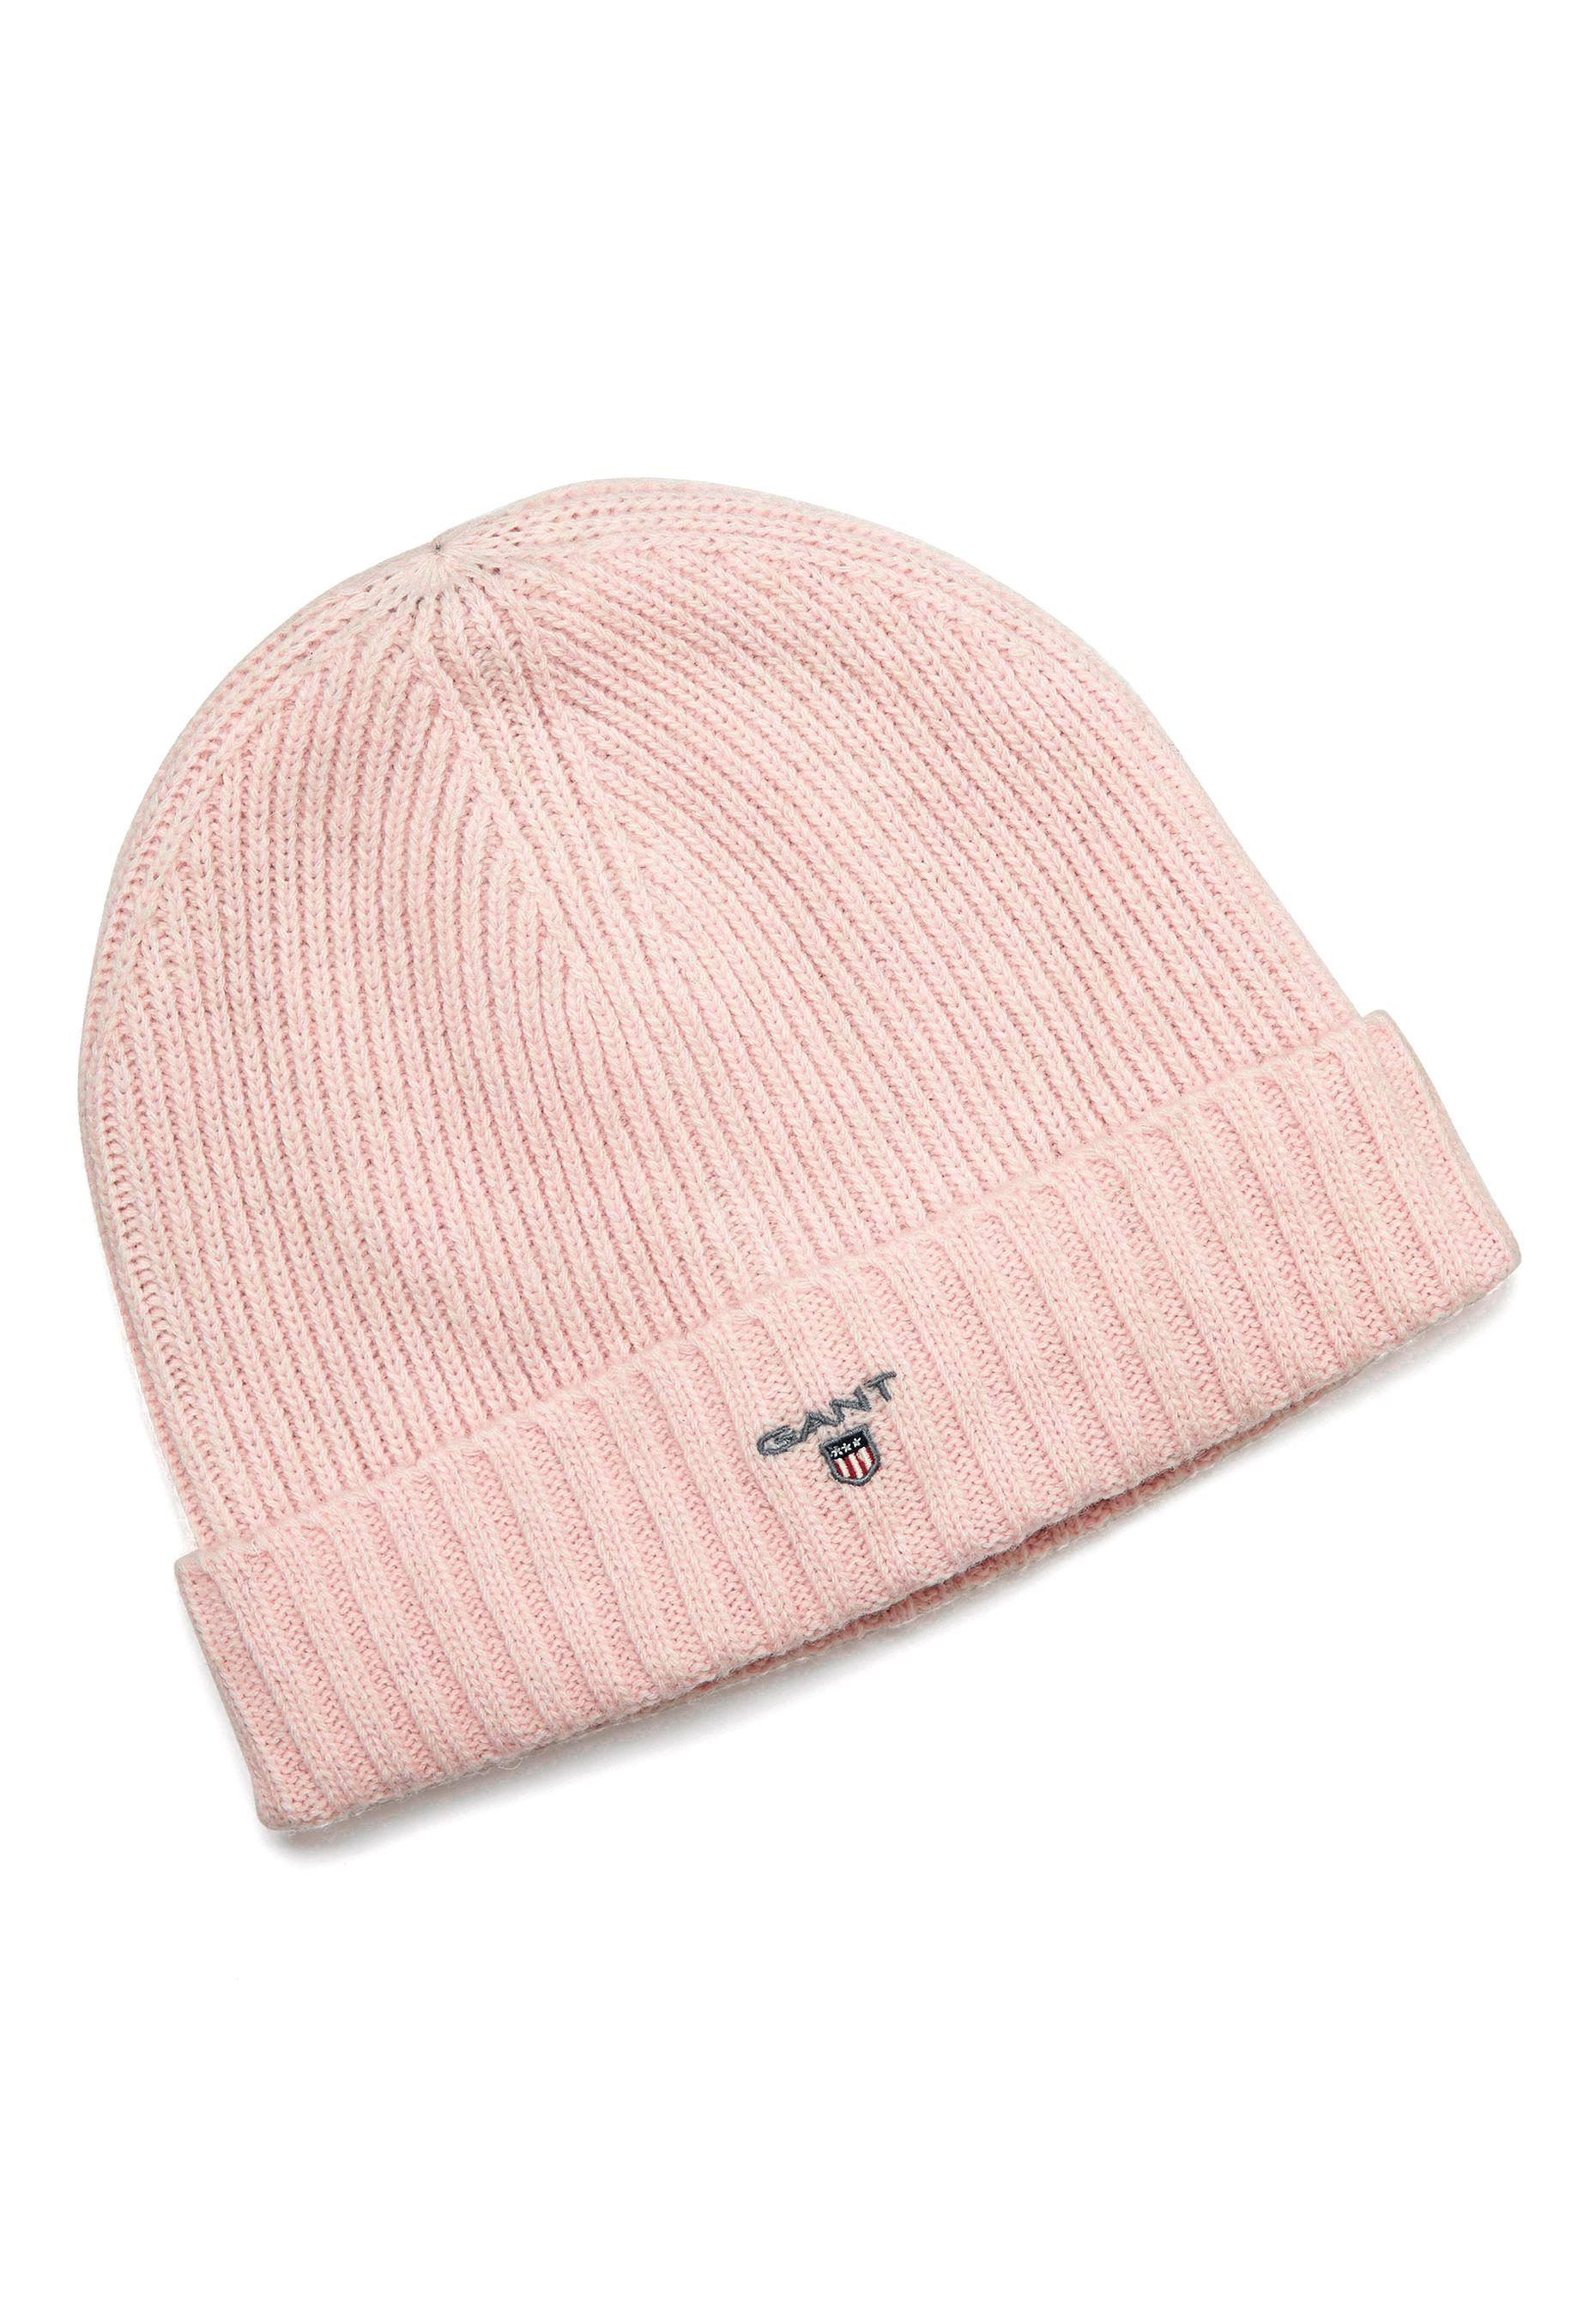 gant mössa rosa